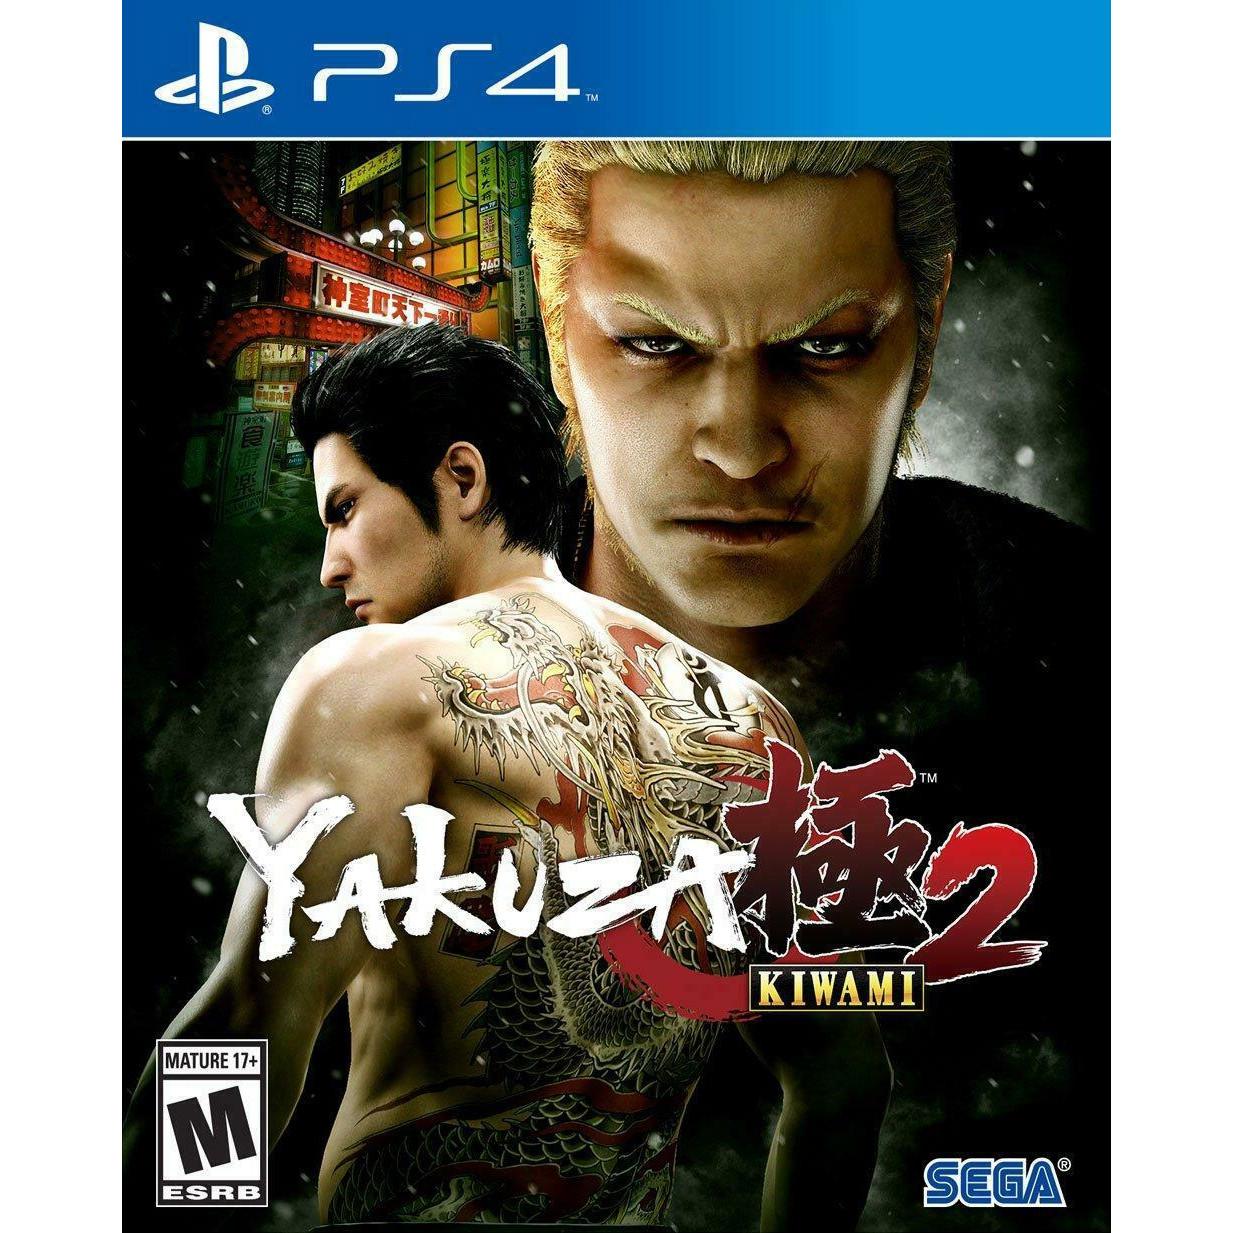 Joc Yakuza Kiwami 2 Pentru PlayStation 4 0